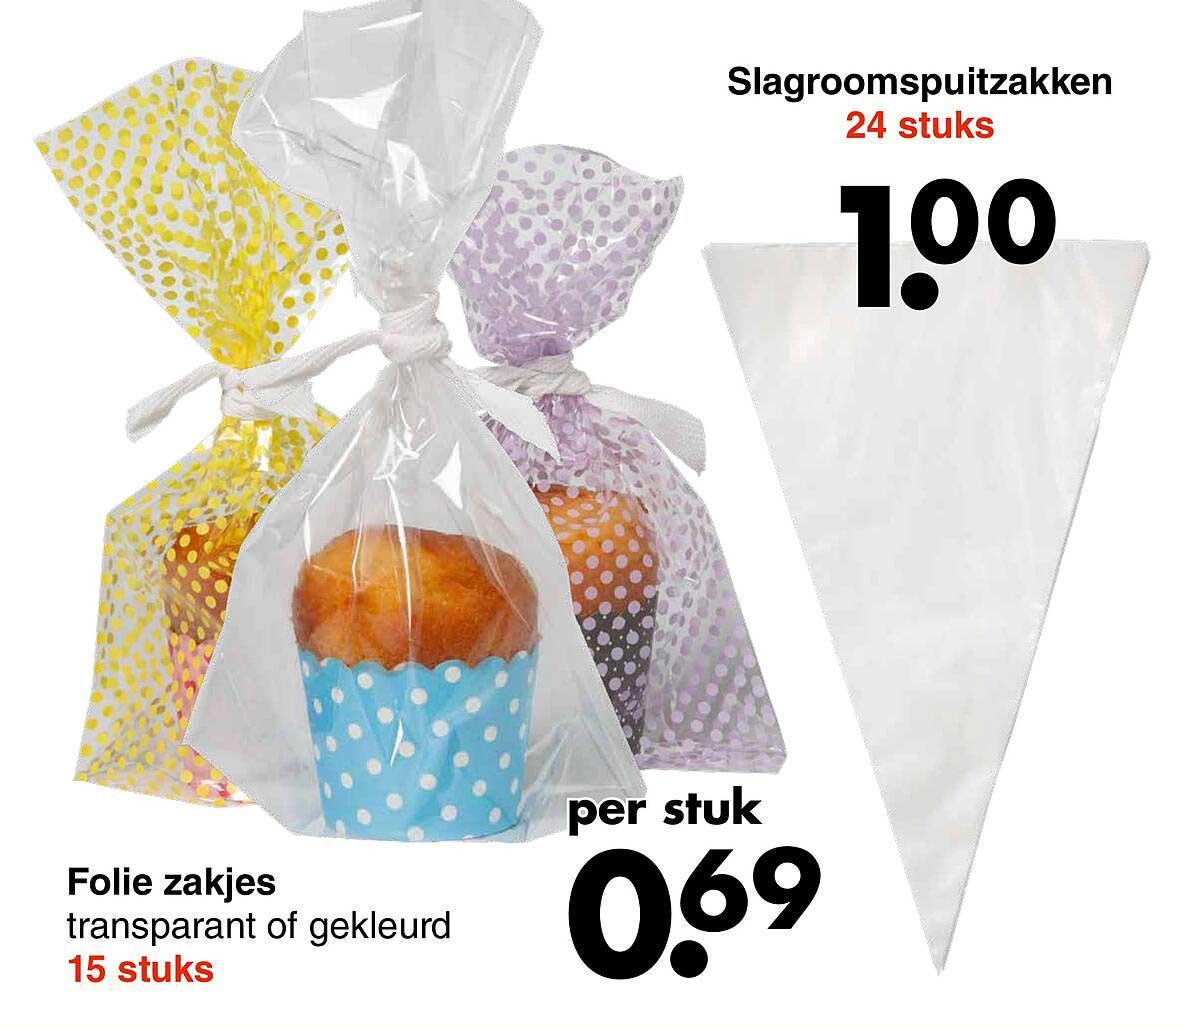 Wibra Slagroomspuitzakken Of Folie Zakjes Transparant Of Gekleurd